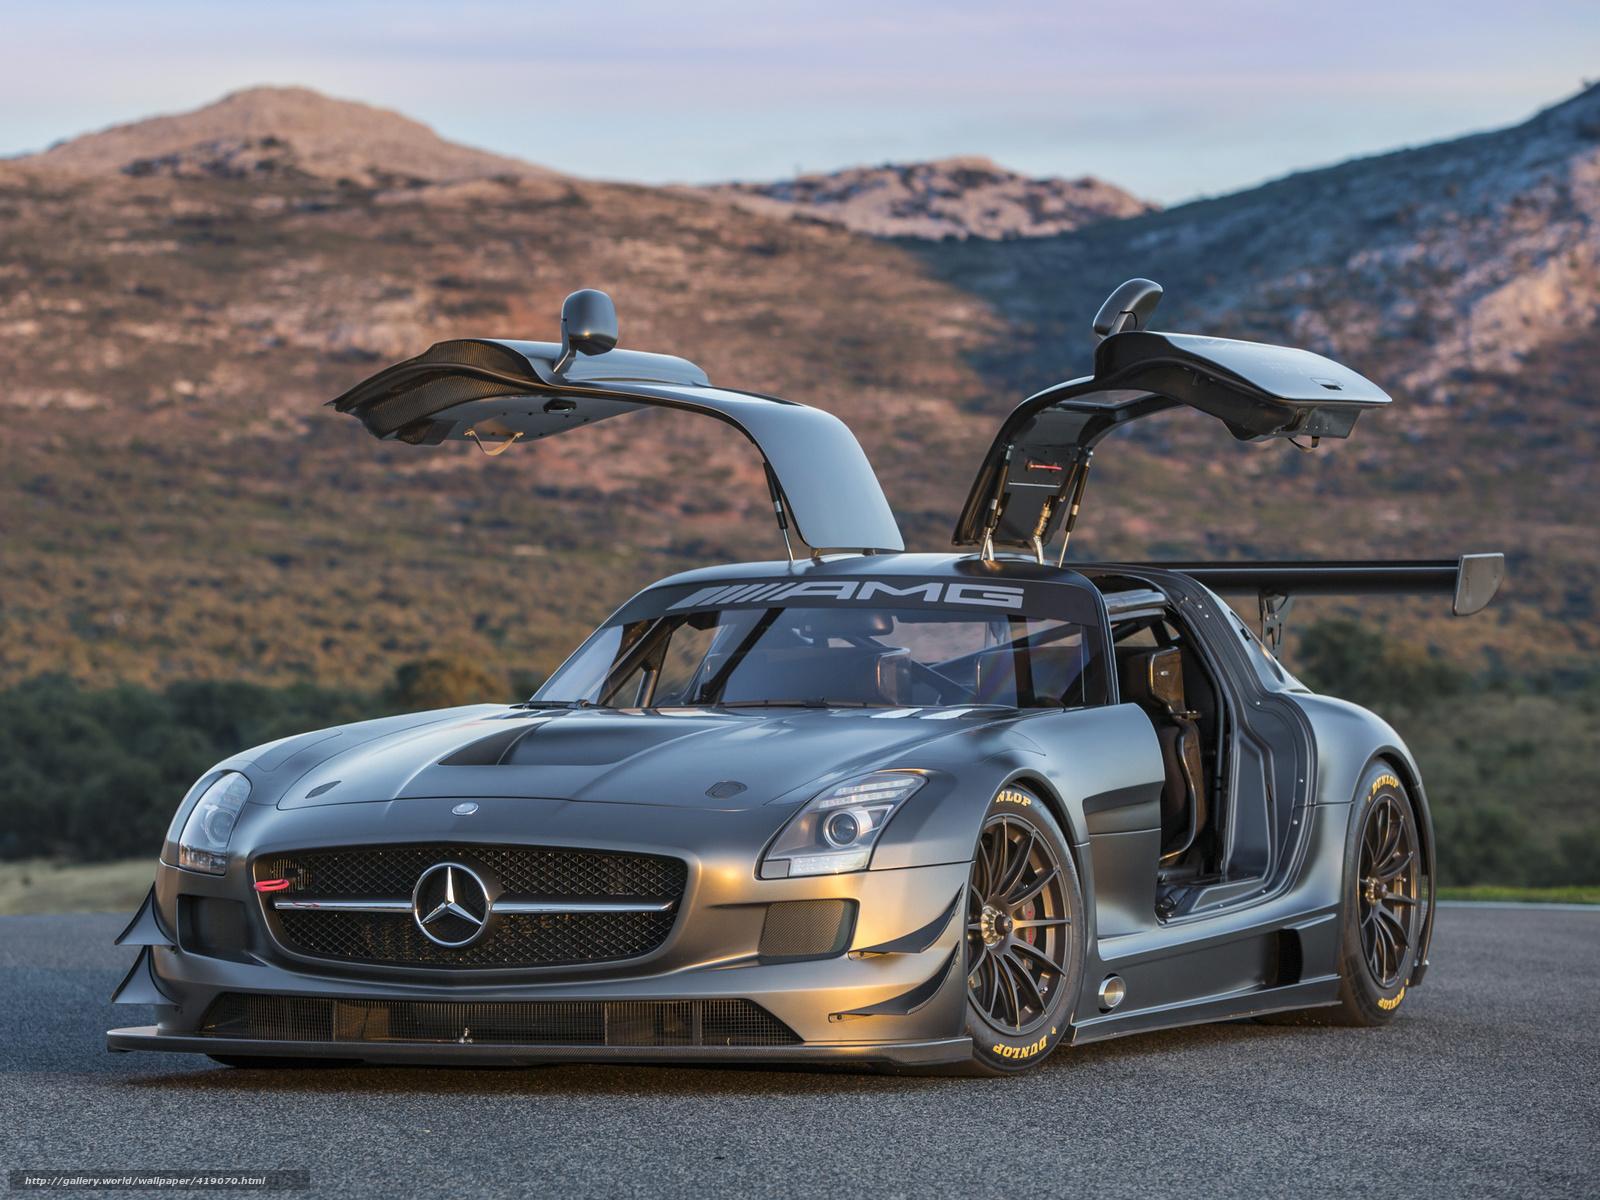 Tlcharger fond d 39 ecran voiture de sport montagnes for Fond ecran voiture sport